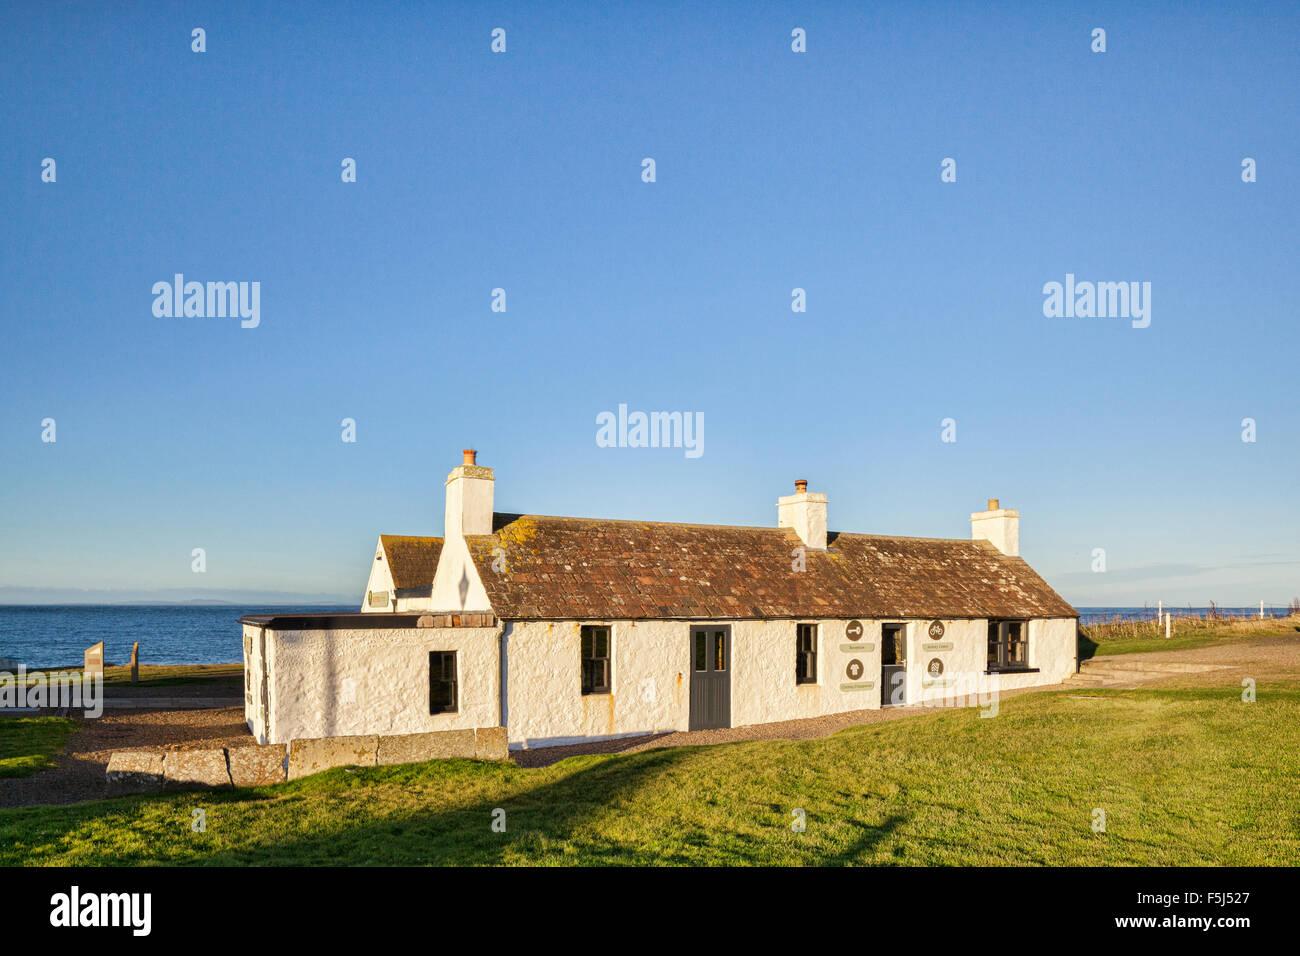 The 'Last House in Scotland' at John o' Groats, Caithness, Scotland. - Stock Image